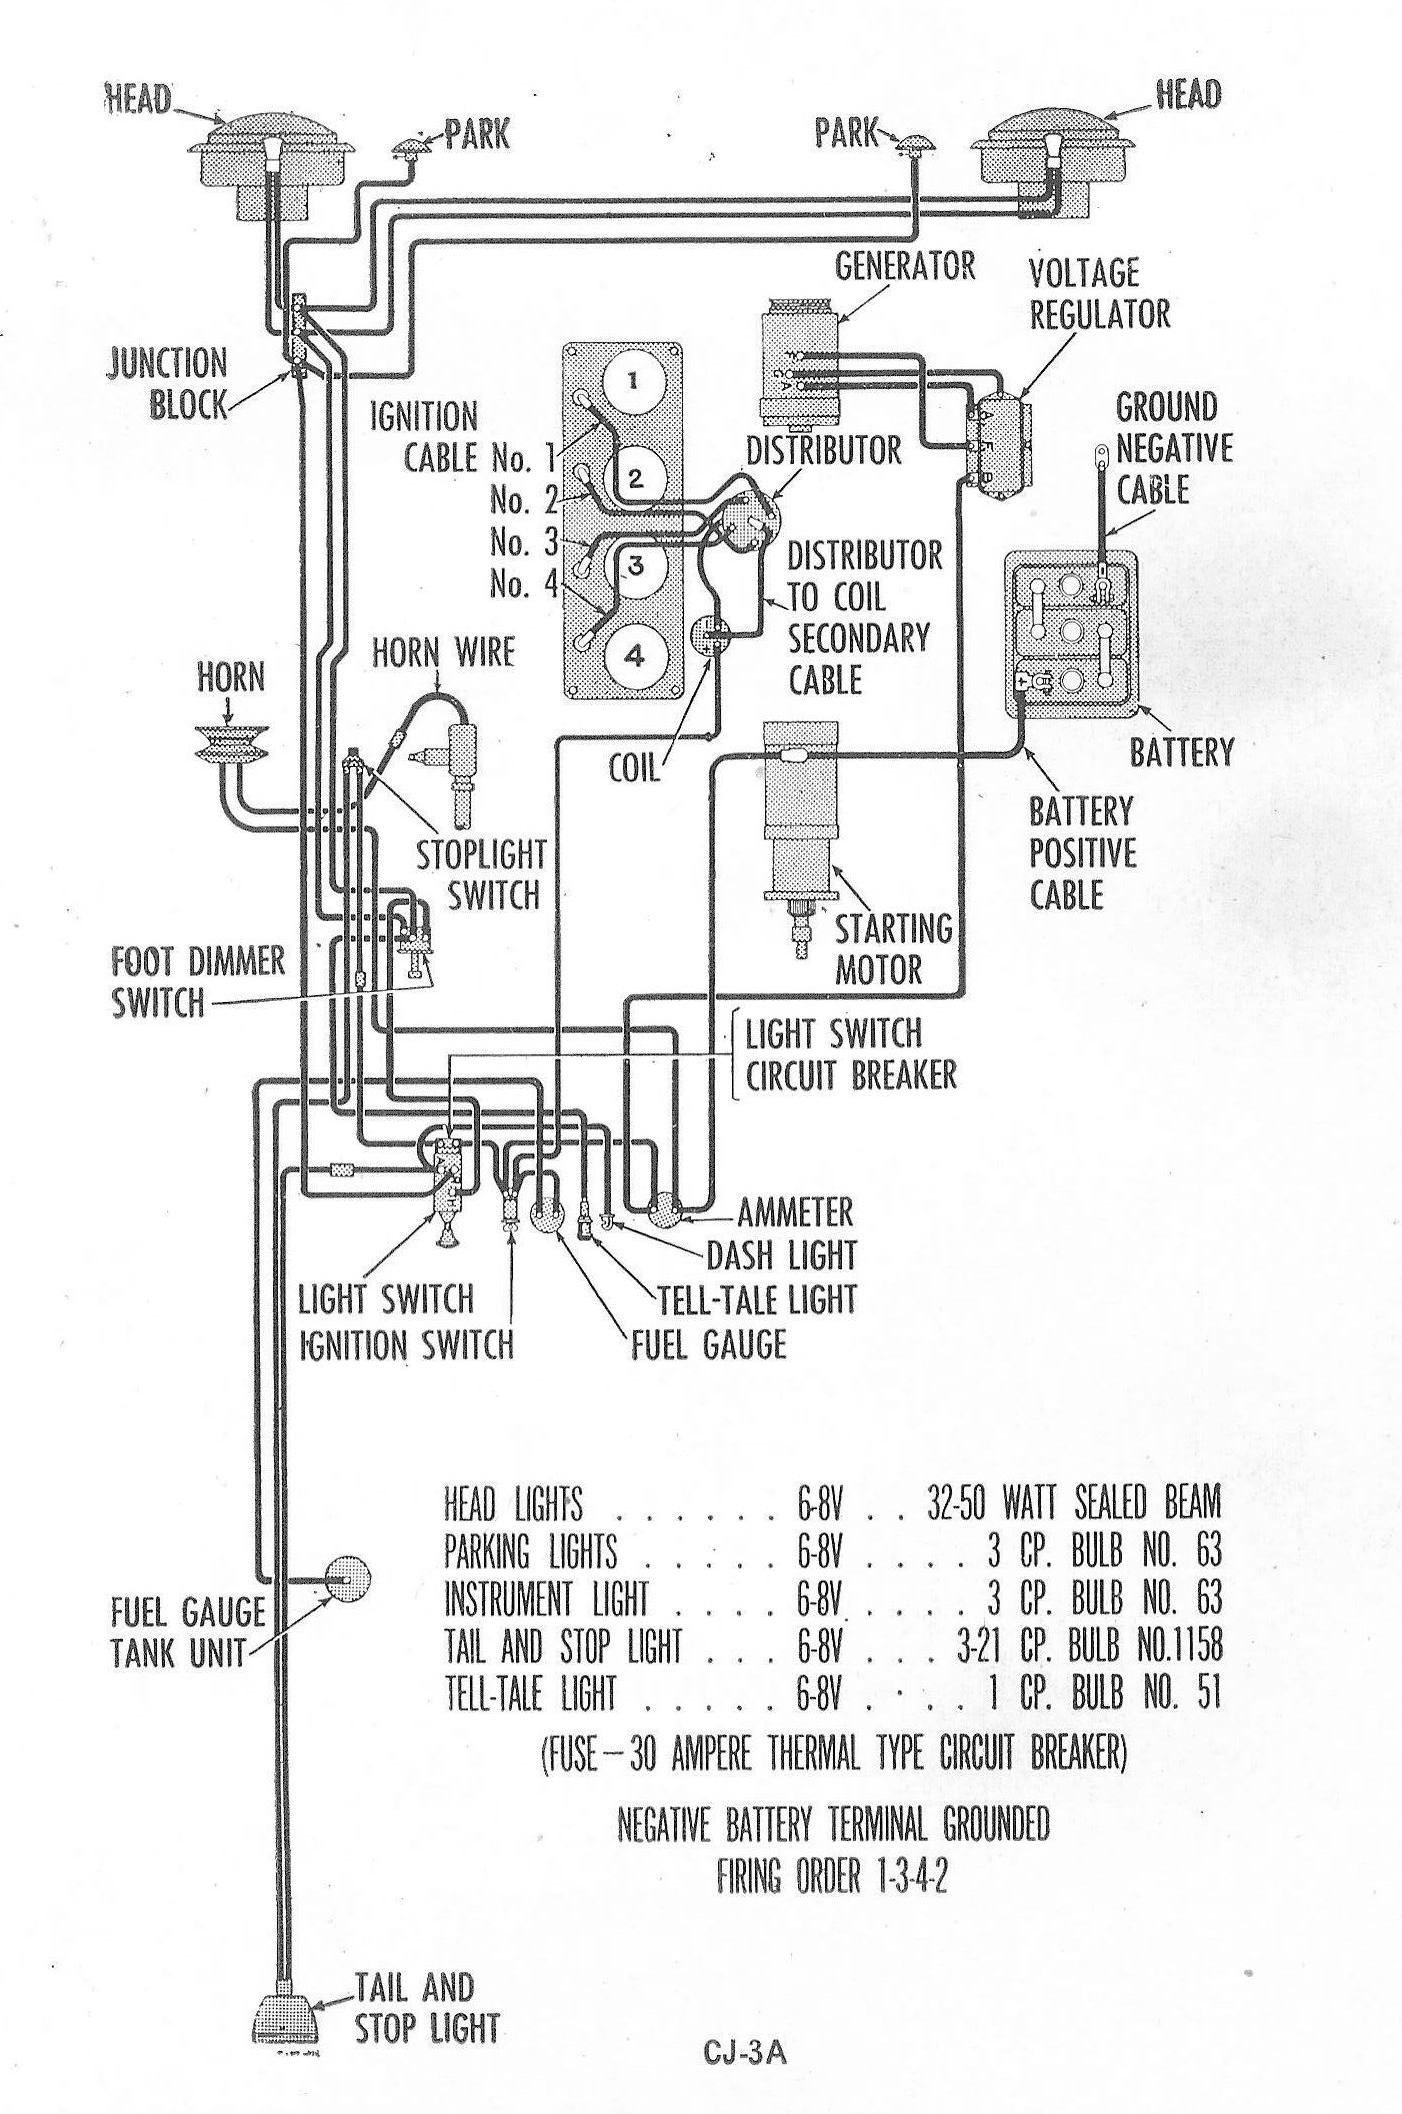 1953 cj3a wiring diagram schematic vc 0327  wiring diagram jeep cj3b schematic wiring  wiring diagram jeep cj3b schematic wiring